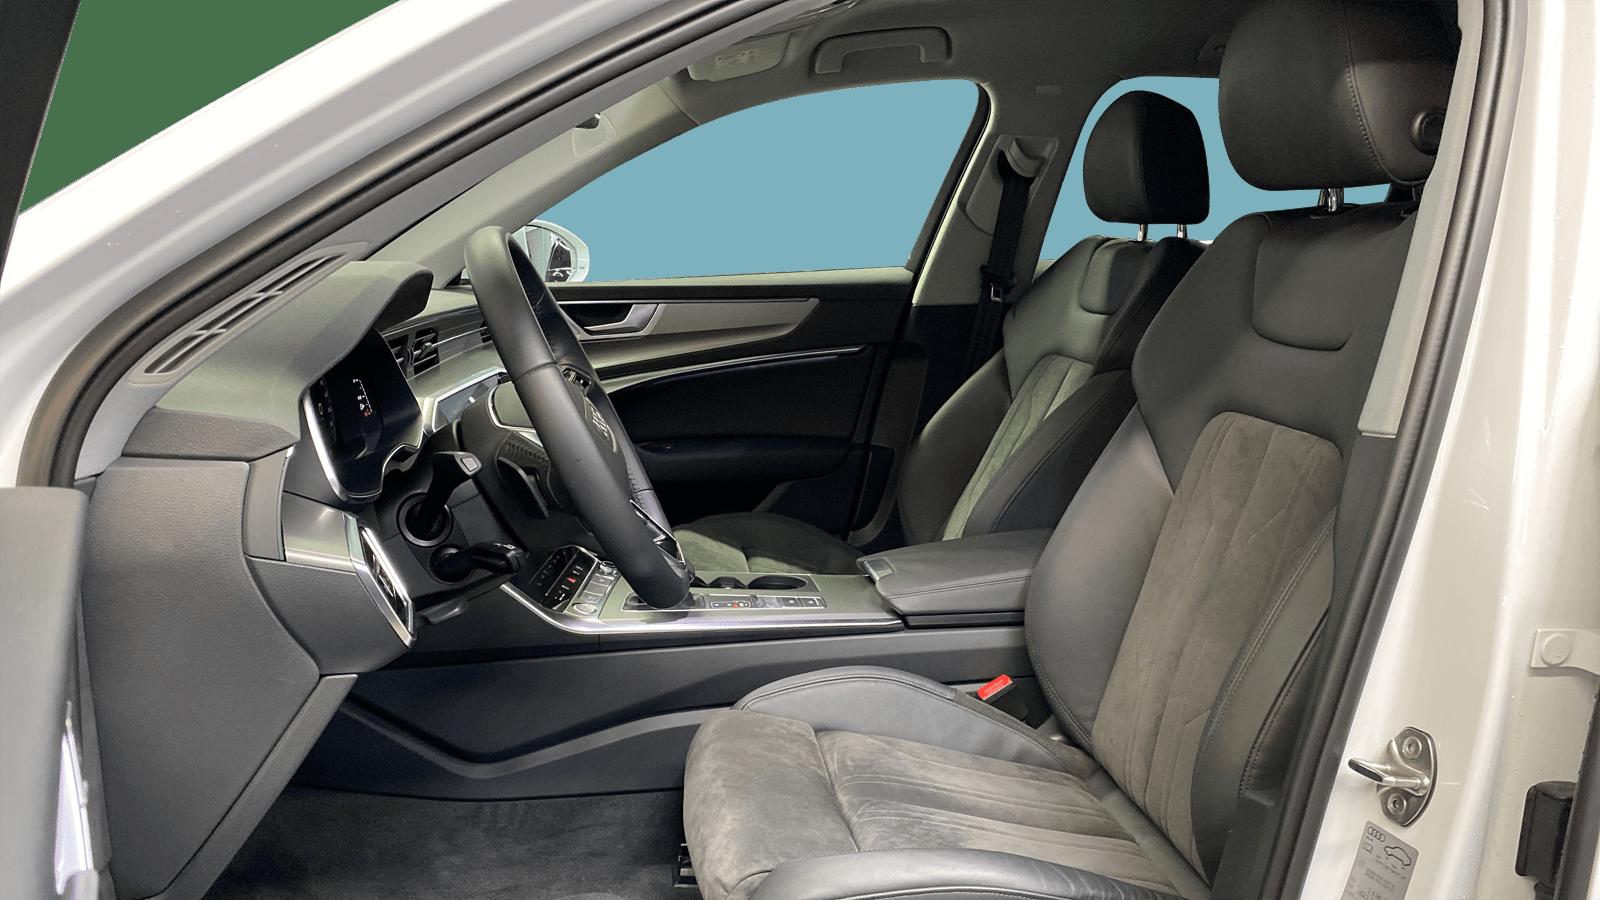 Audi A6 Avant White interior - Clyde car subscription